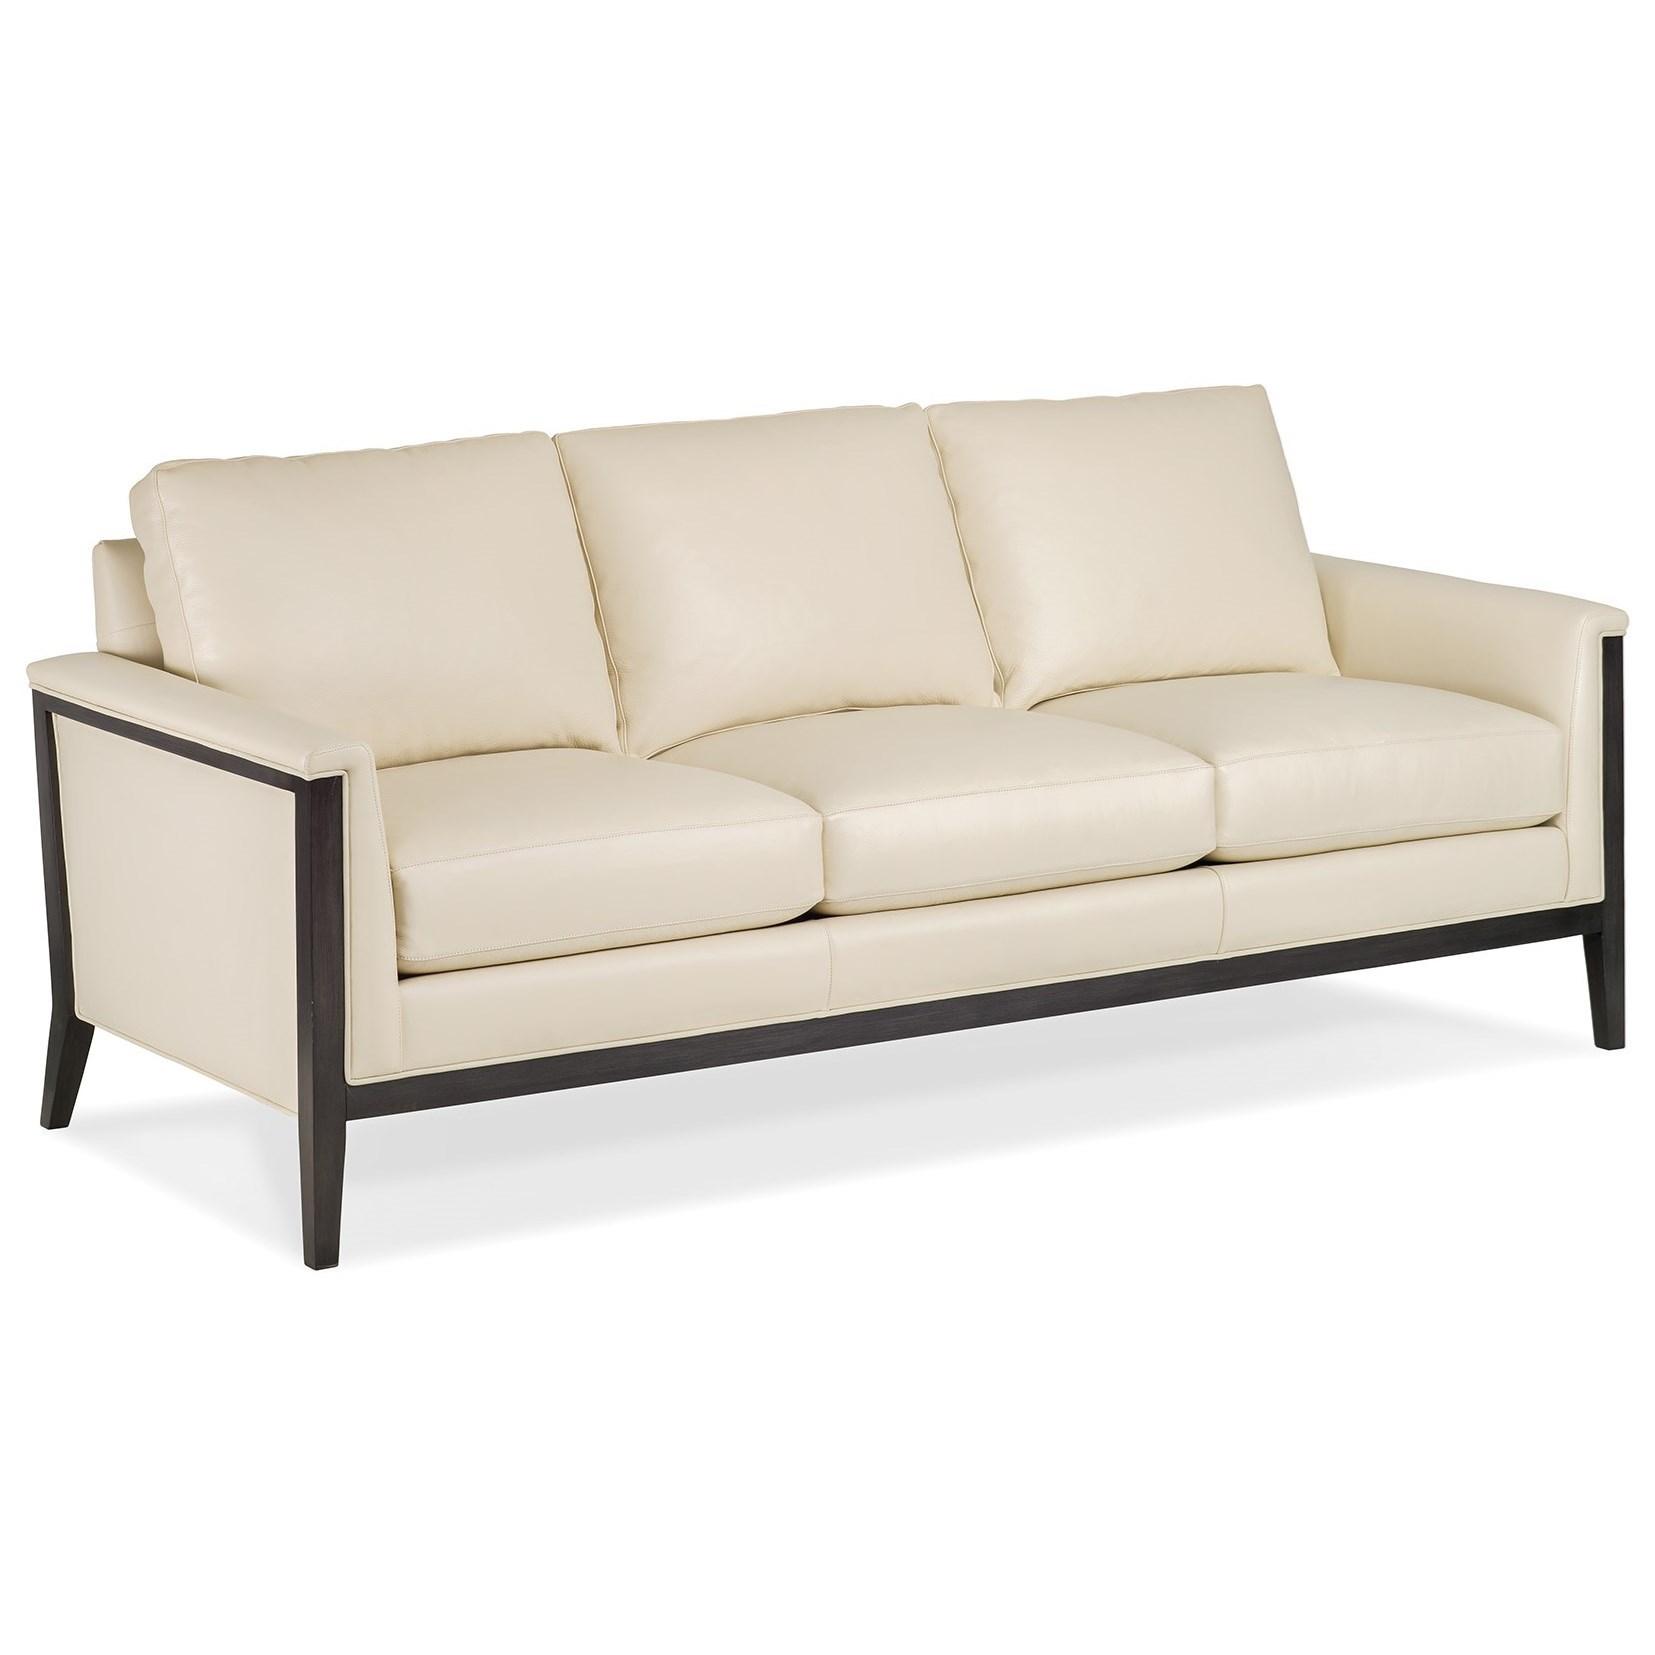 Hancock U0026 Moore Ava Contemporary Sofa With Exposed Wood Frame